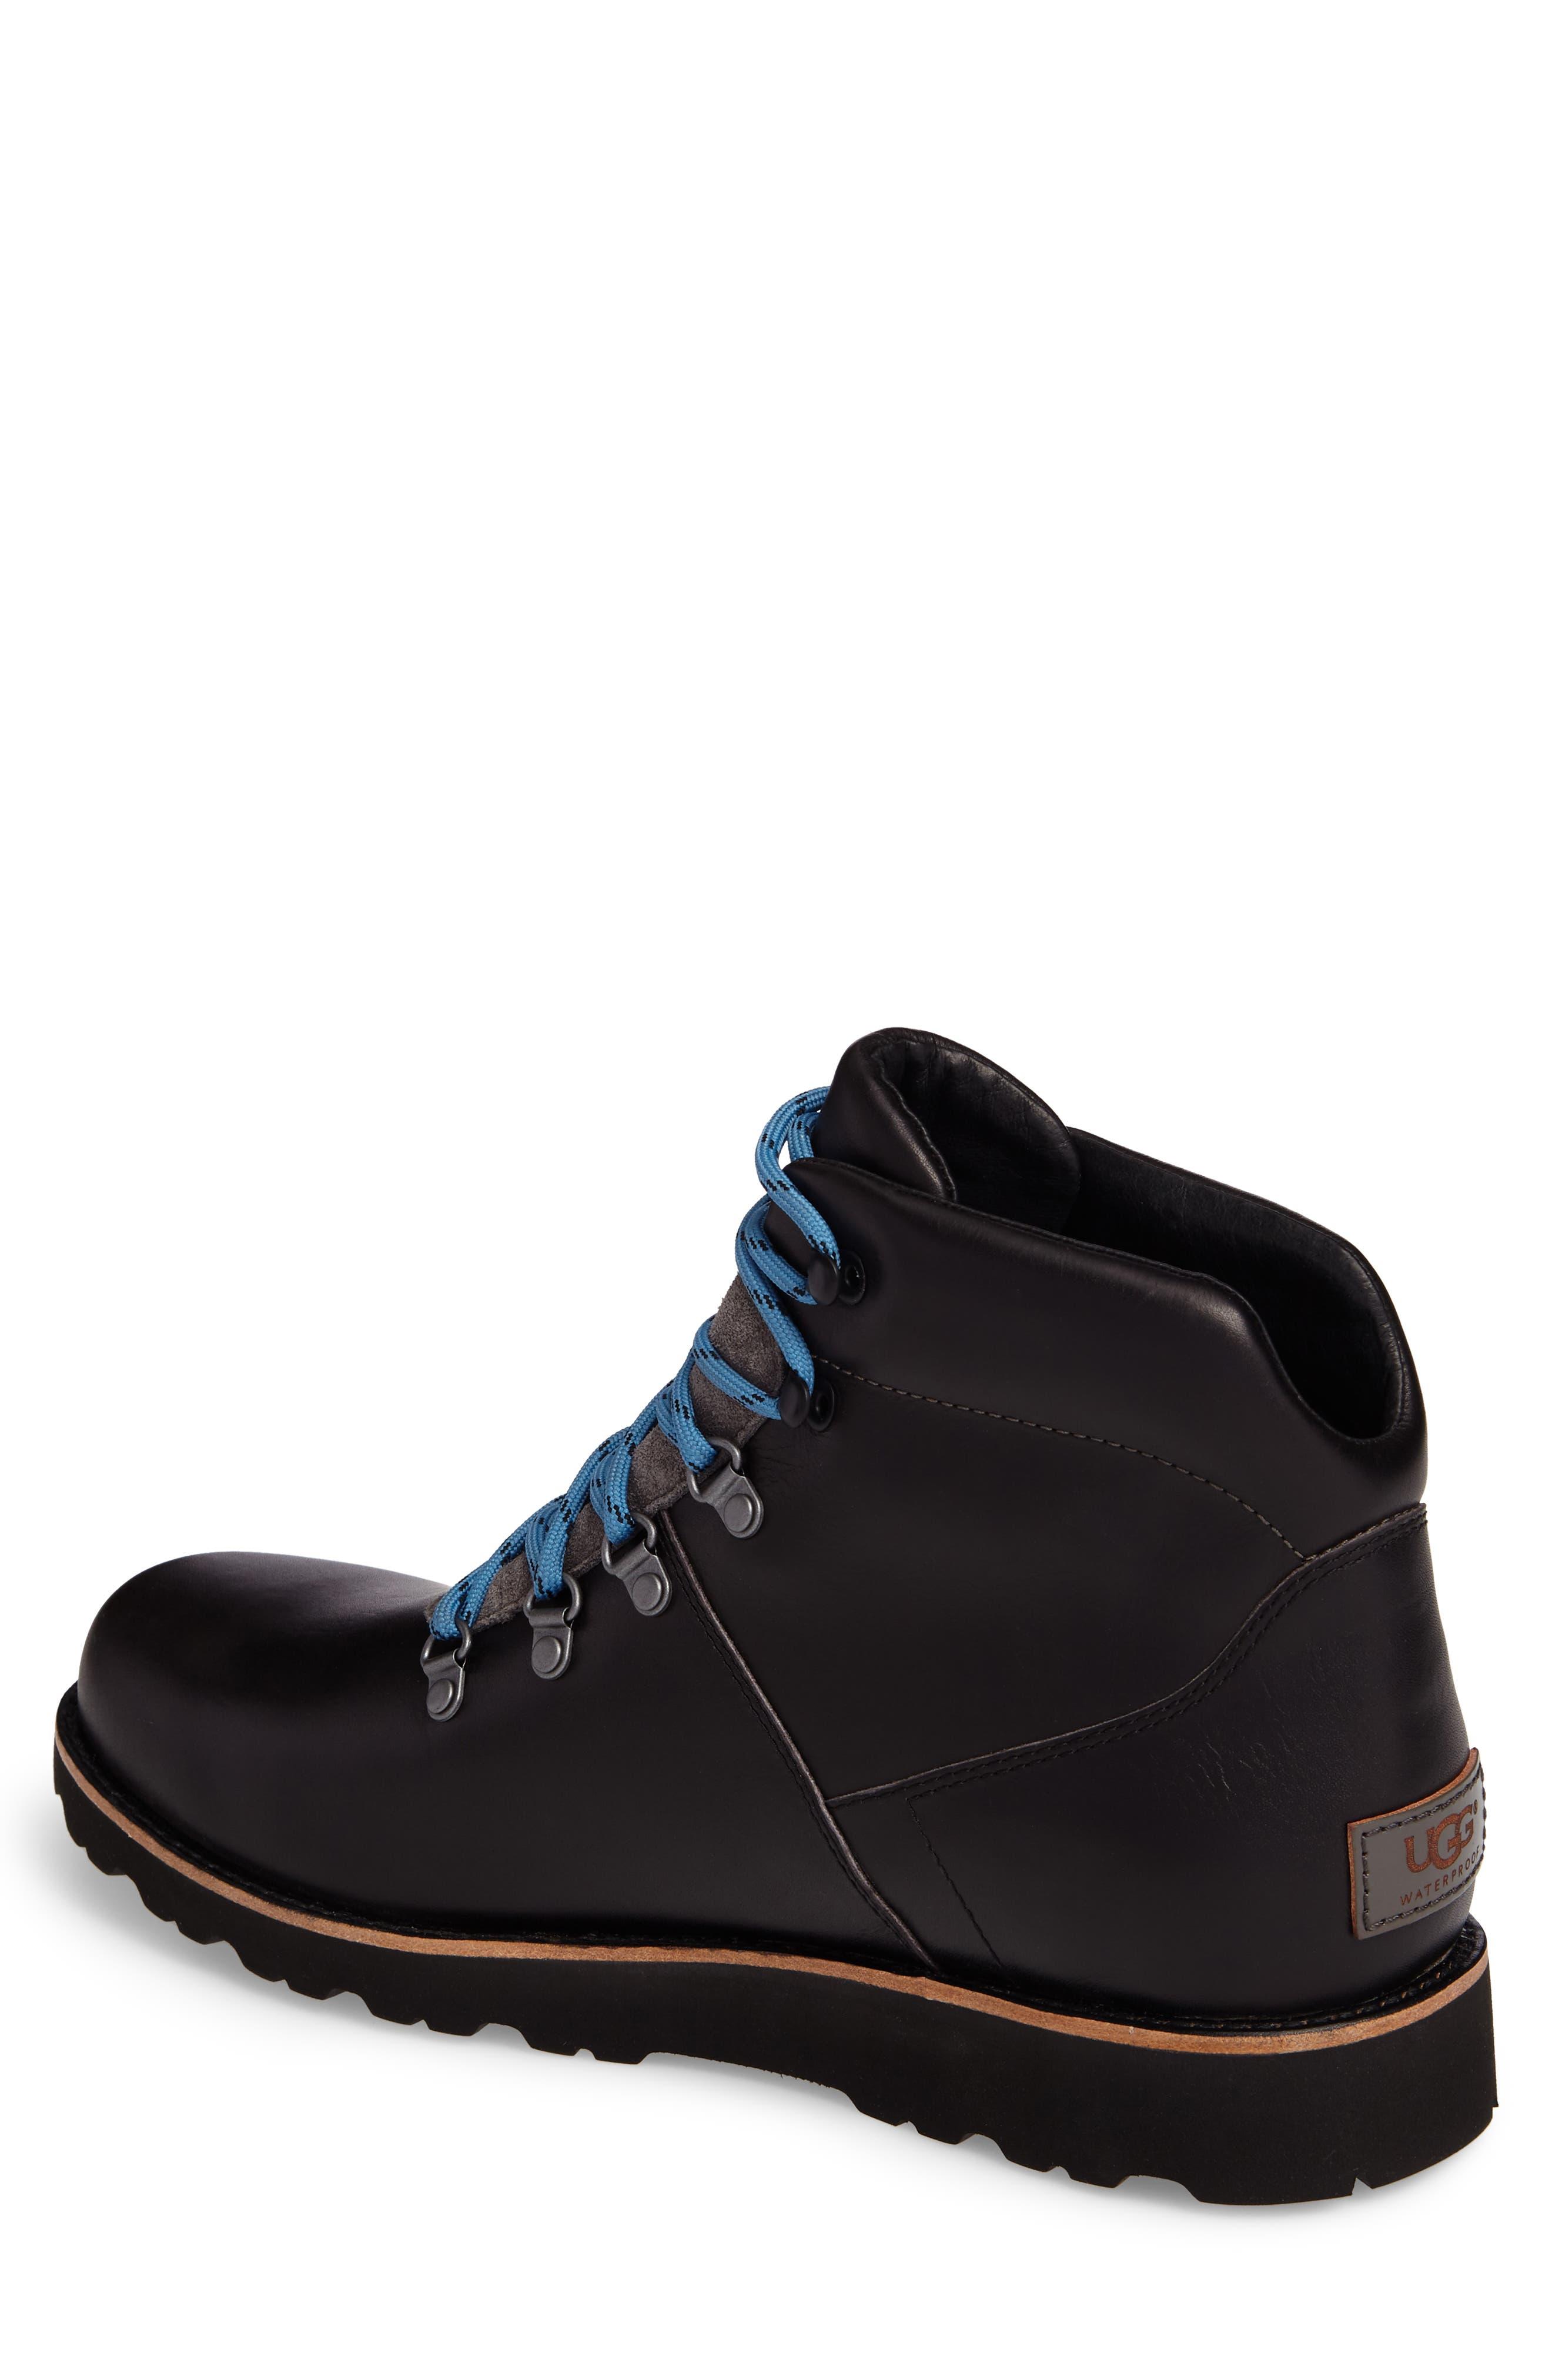 Halfstein Plain Toe Waterproof Boot,                             Alternate thumbnail 2, color,                             CHARCOAL